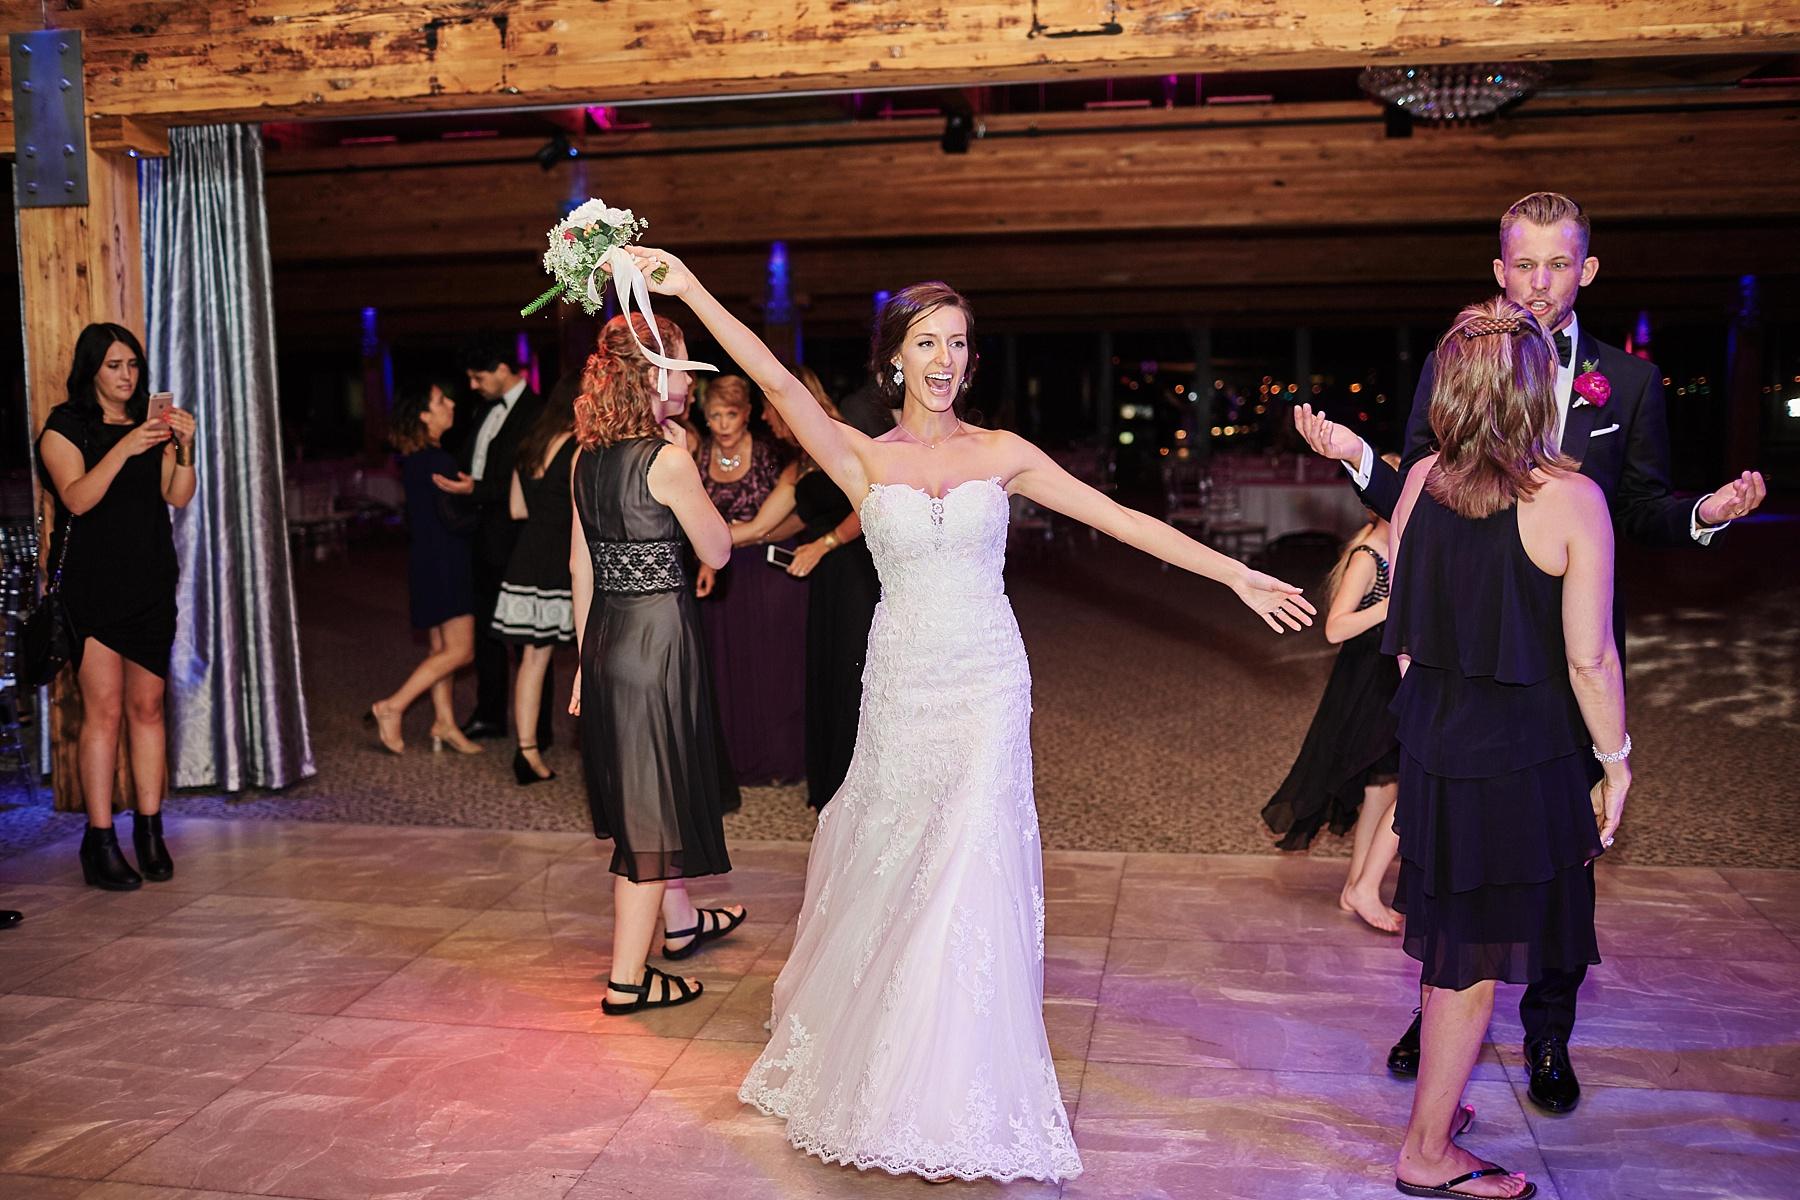 ABULAE-Wedding-Saint-paul-MN-Josh-Sofia-Wedding-Mears-Park_0861.jpg